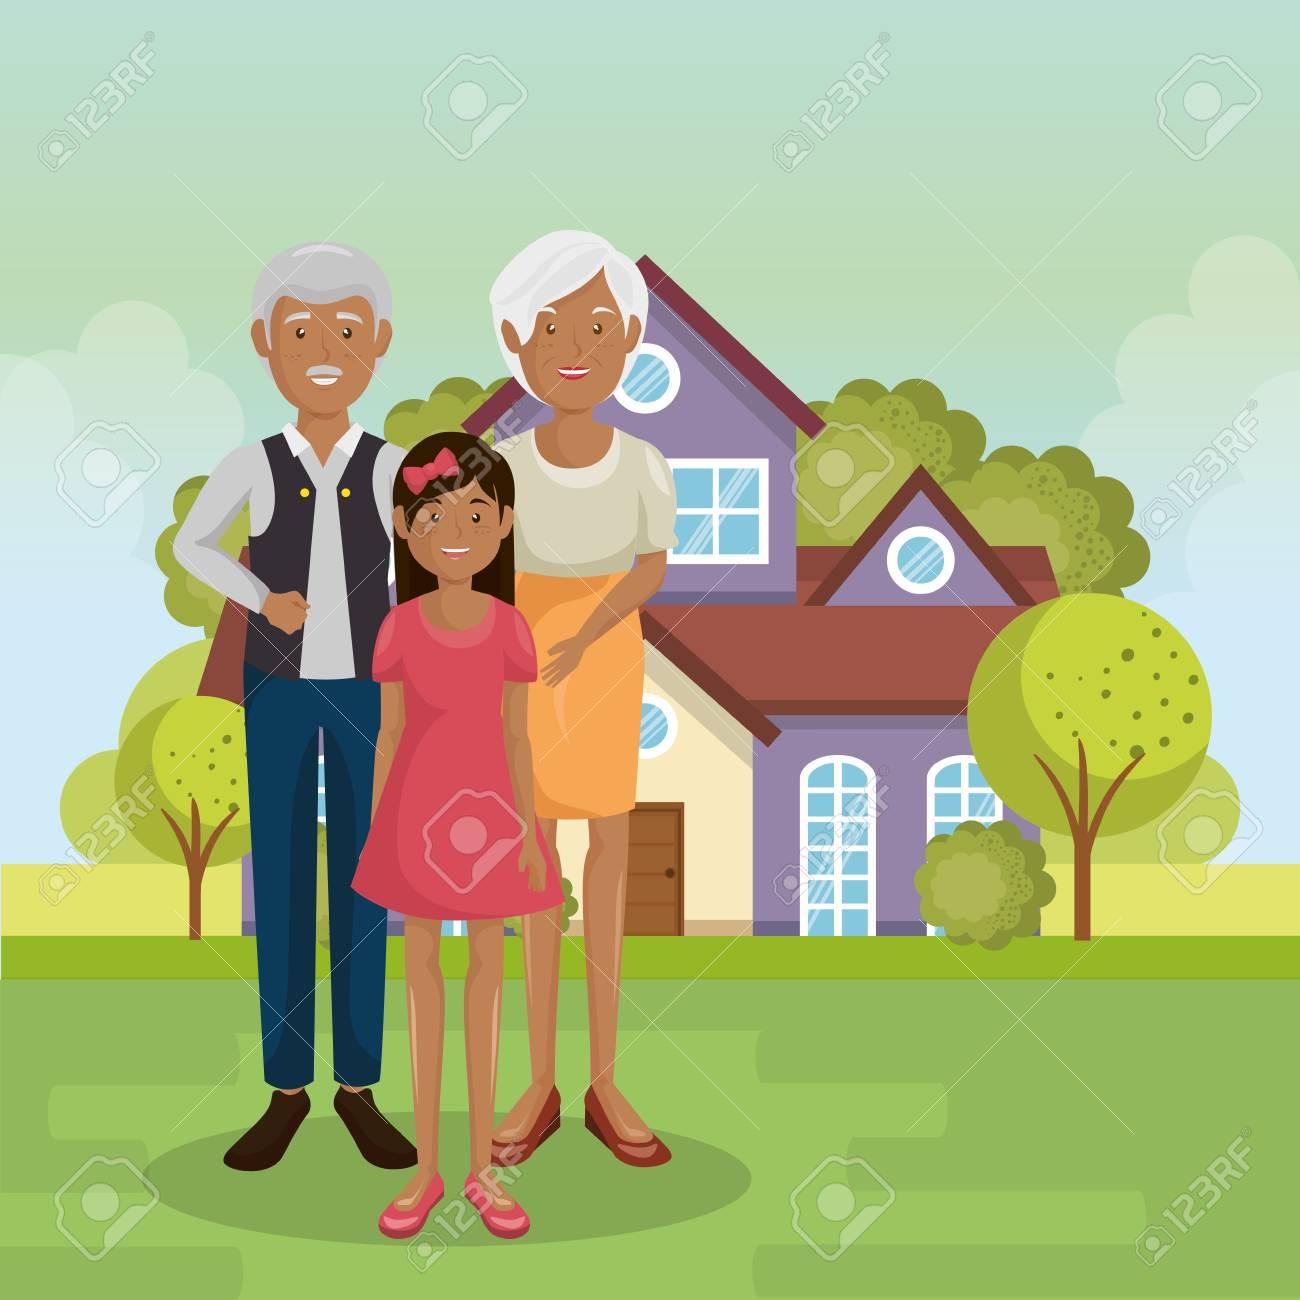 family members outside of the house vector illustration design - 96196834